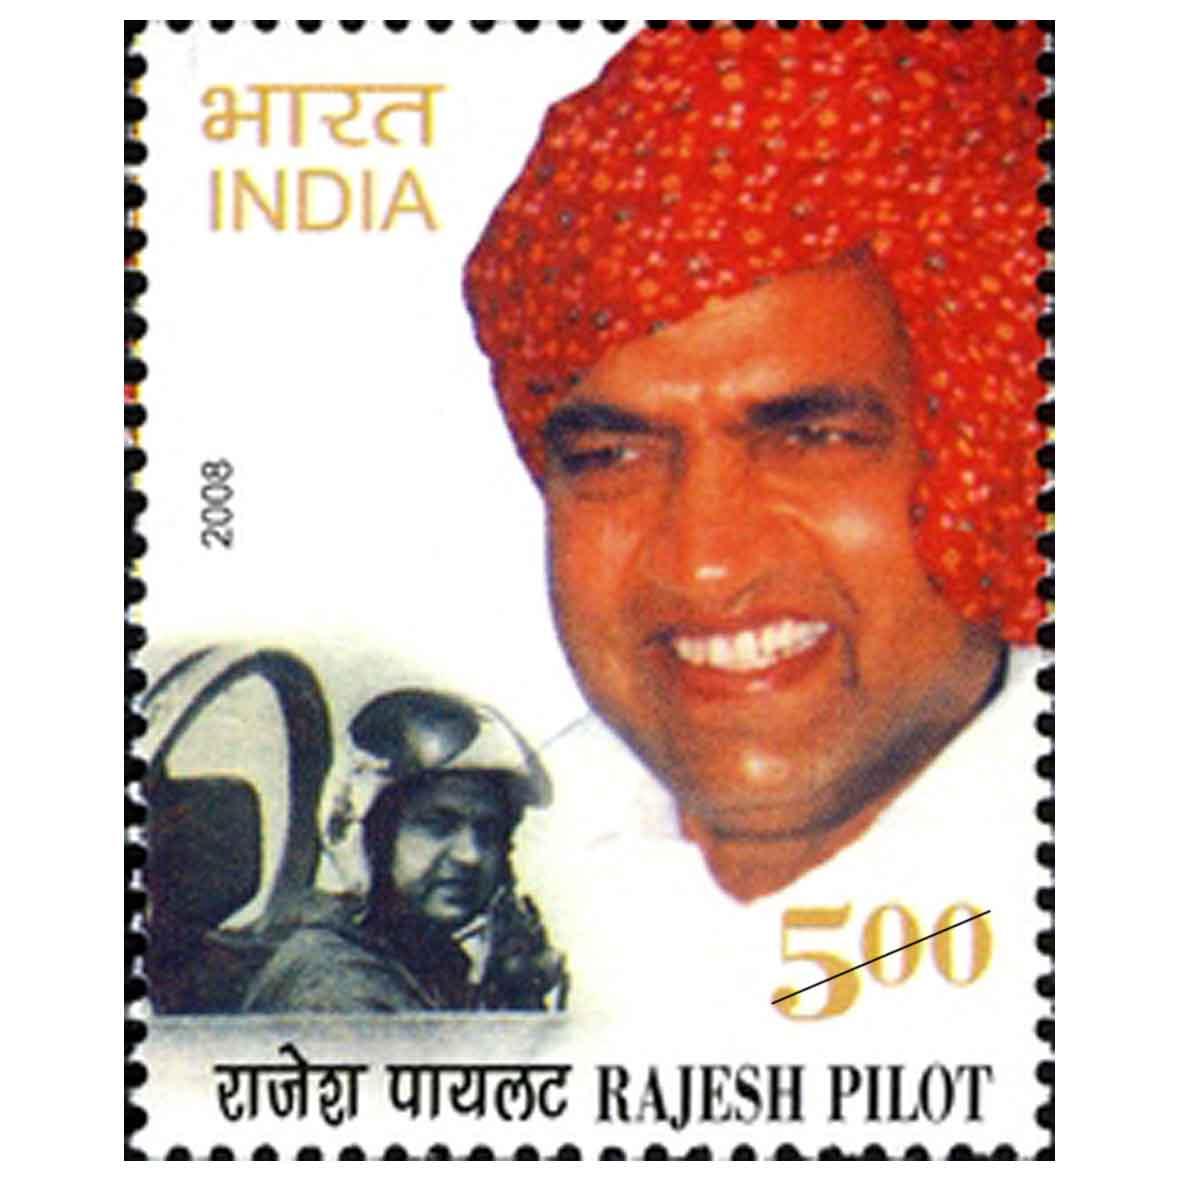 hindu single men in pilot grove James stephen steve fossett as a sailor, and as a solo flight fixed-wing aircraft pilot a single-engine jet aircraft.